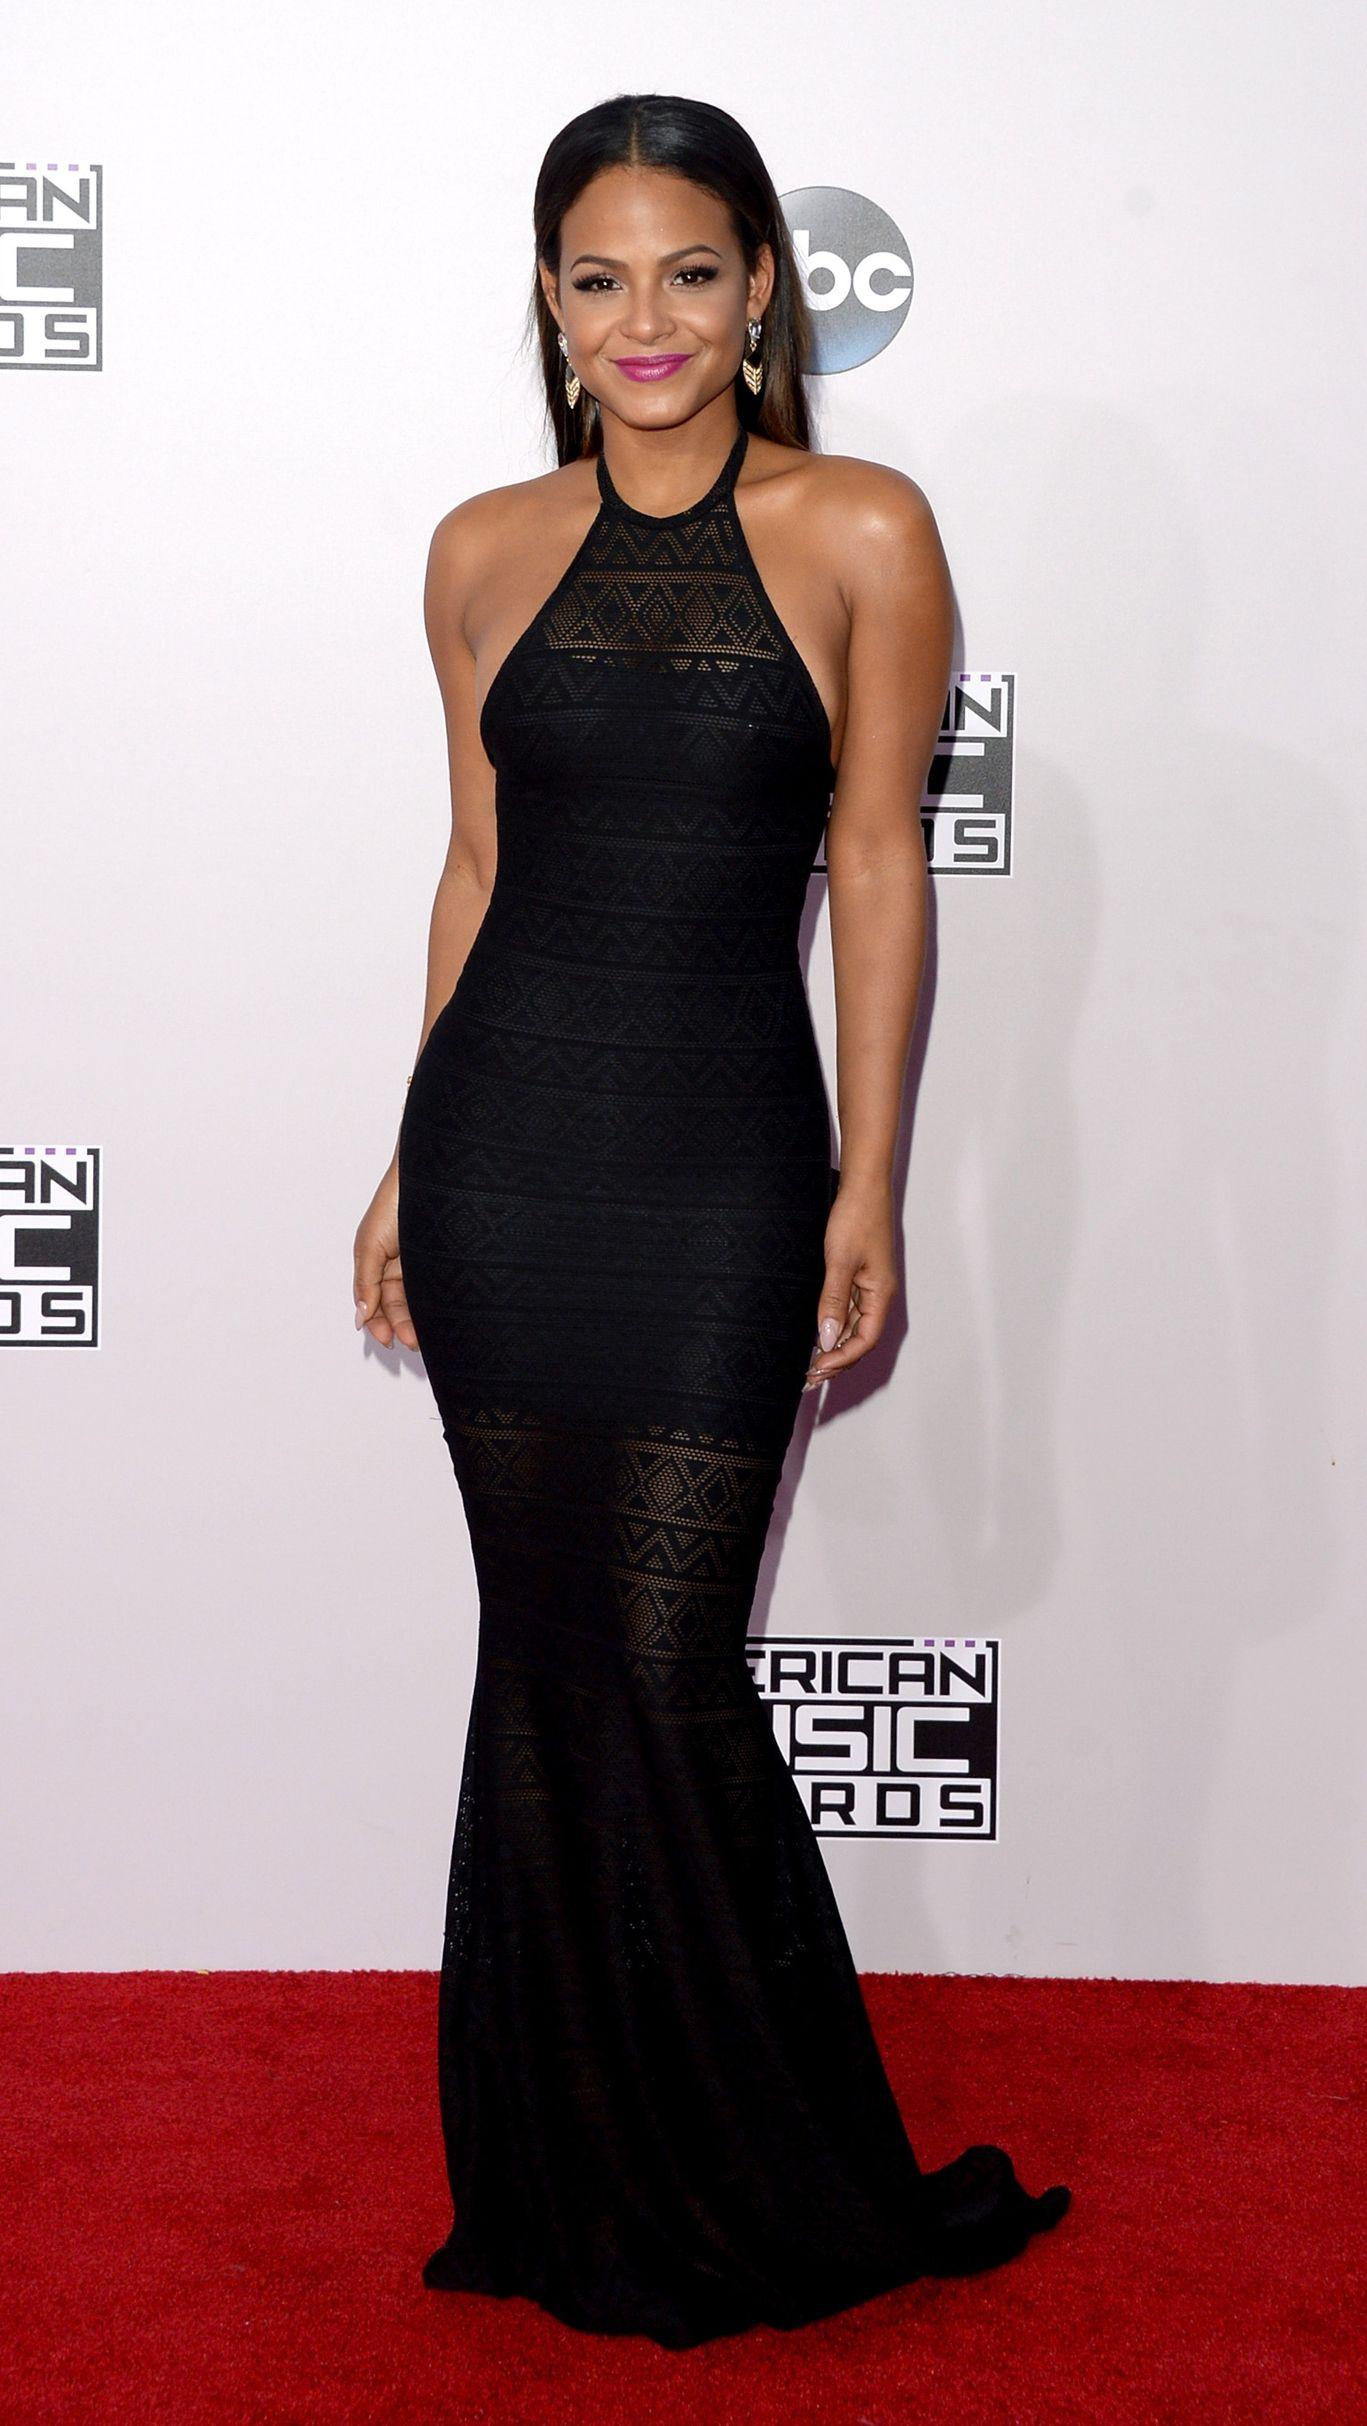 ef081d7c6d Who  Christina Milian Wore  A slinky black halter dress Where  2014  American Music